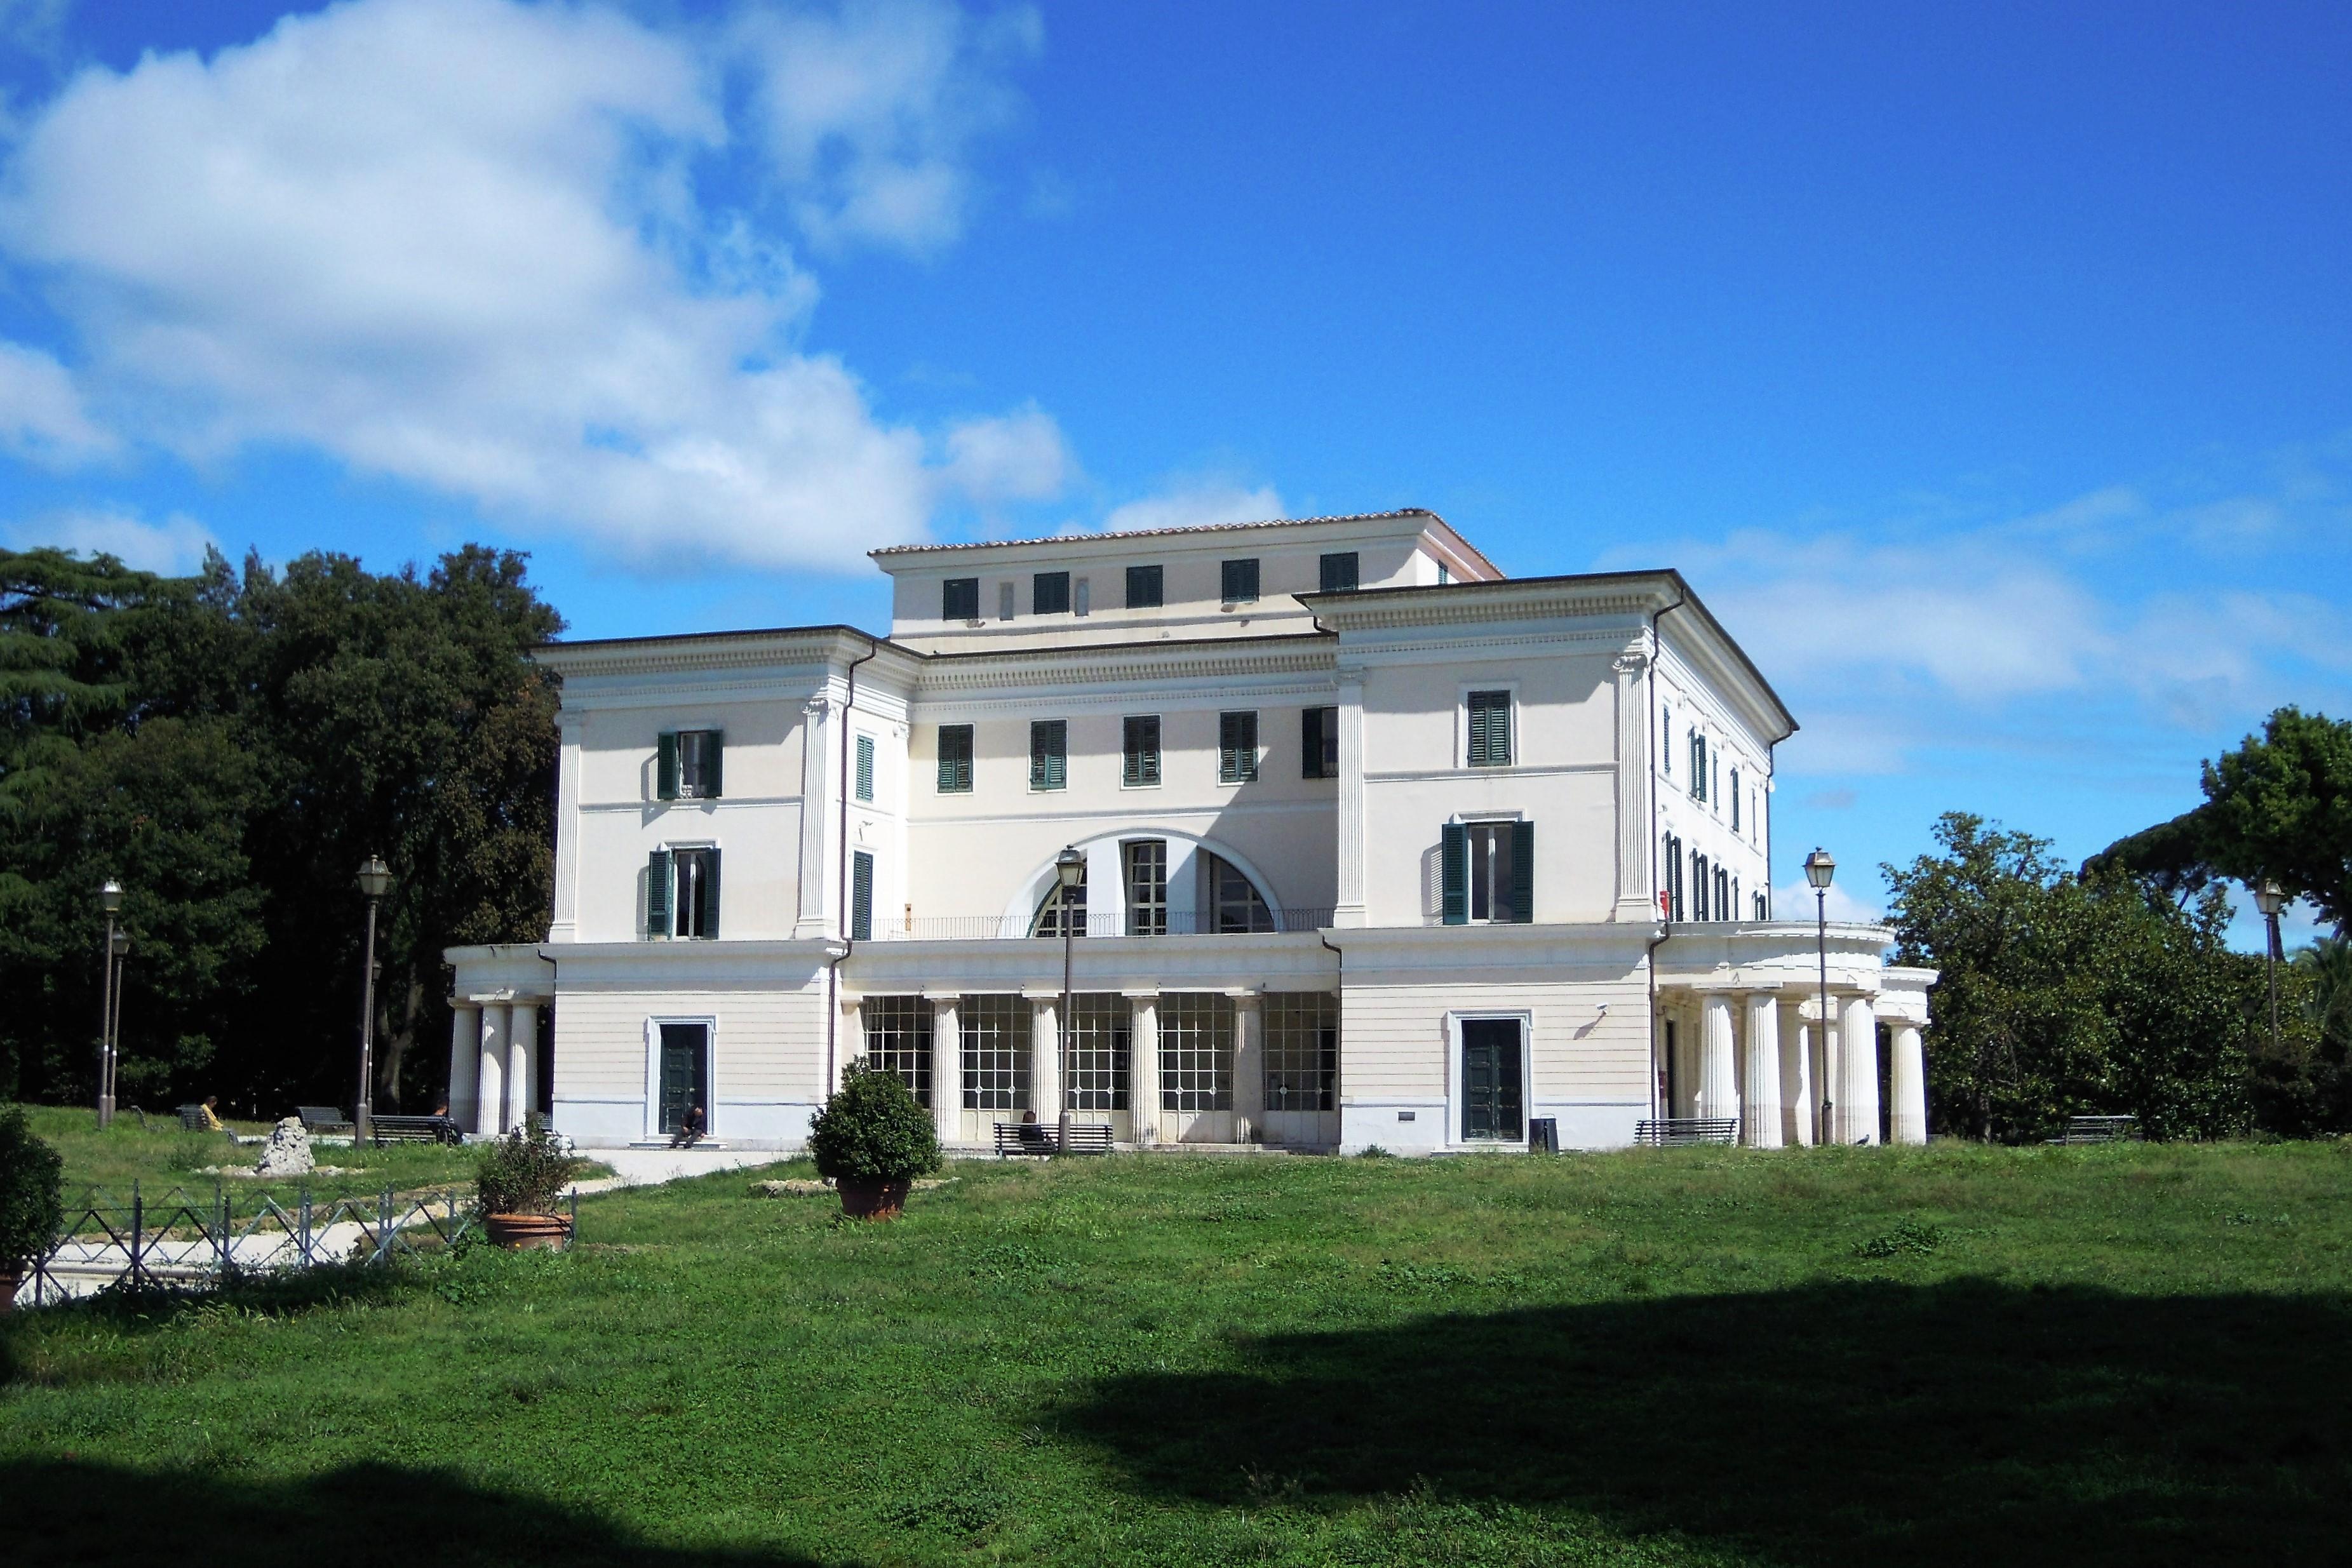 Villa torlonia (roma)   wikiwand